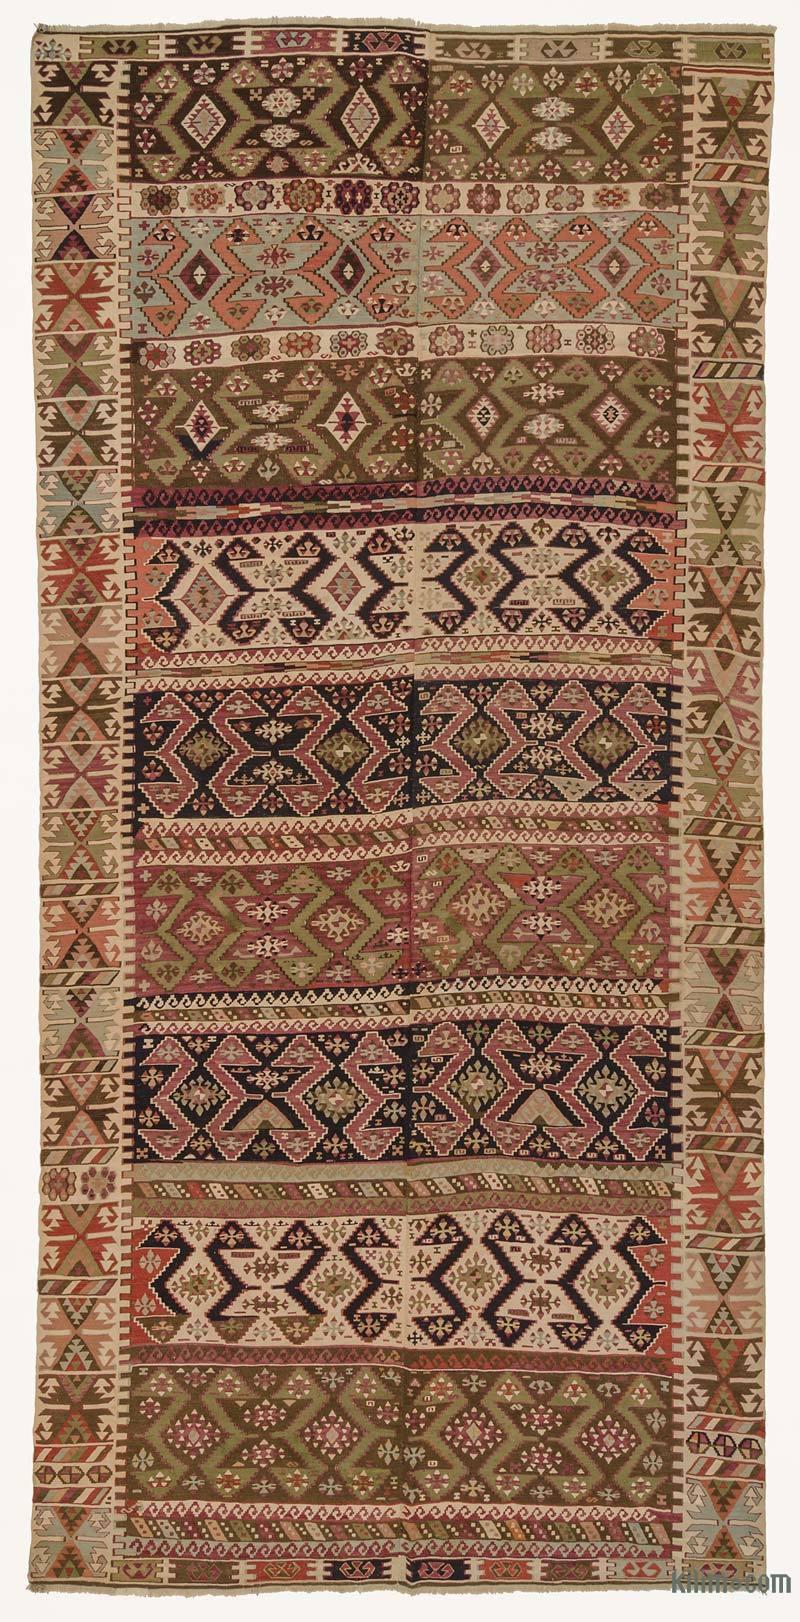 "Multicolor Antique Malatya Kilim Rug - 5' 11"" x 12' 6"" (71 in. x 150 in.) - K0005959"